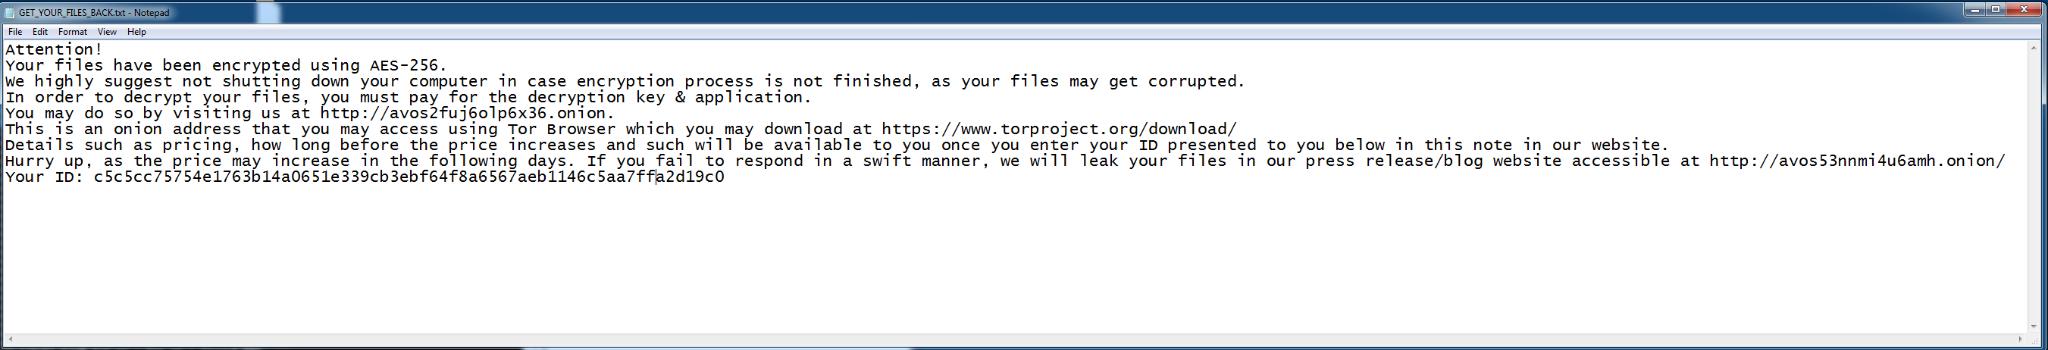 AvosLockerの身代金要求メモ(Get_Your_Files_Back.txtファイルより)「注意!お客様のファイルはAES-256で暗号化されています。暗号化処理が完了していない場合、ファイルが破損する可能性がありますので、コンピュータをシャットダウンしないことを強くお勧めします。ファイルを復号するには復号キーとアプリケーション代を支払う必要があります。」メモはその次に被害者がランサムウェアオペレータに連絡する手順を説明しています。